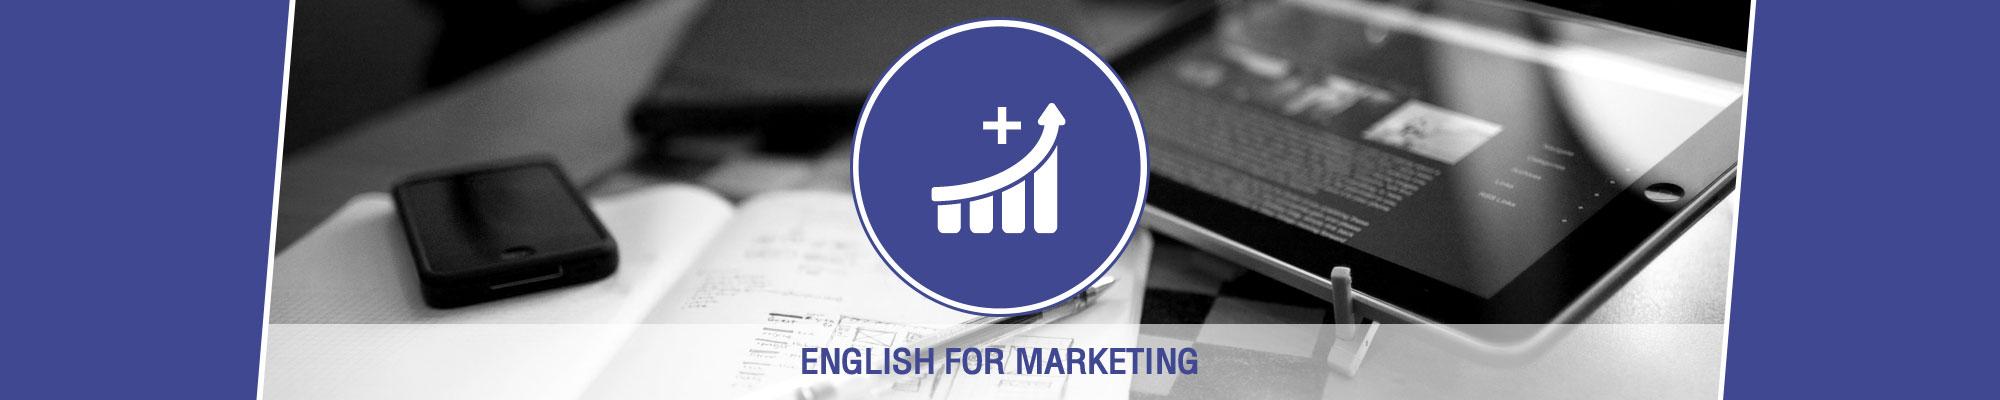 Anglokom Corporate Langauge Training Bangkok -English for Marketing